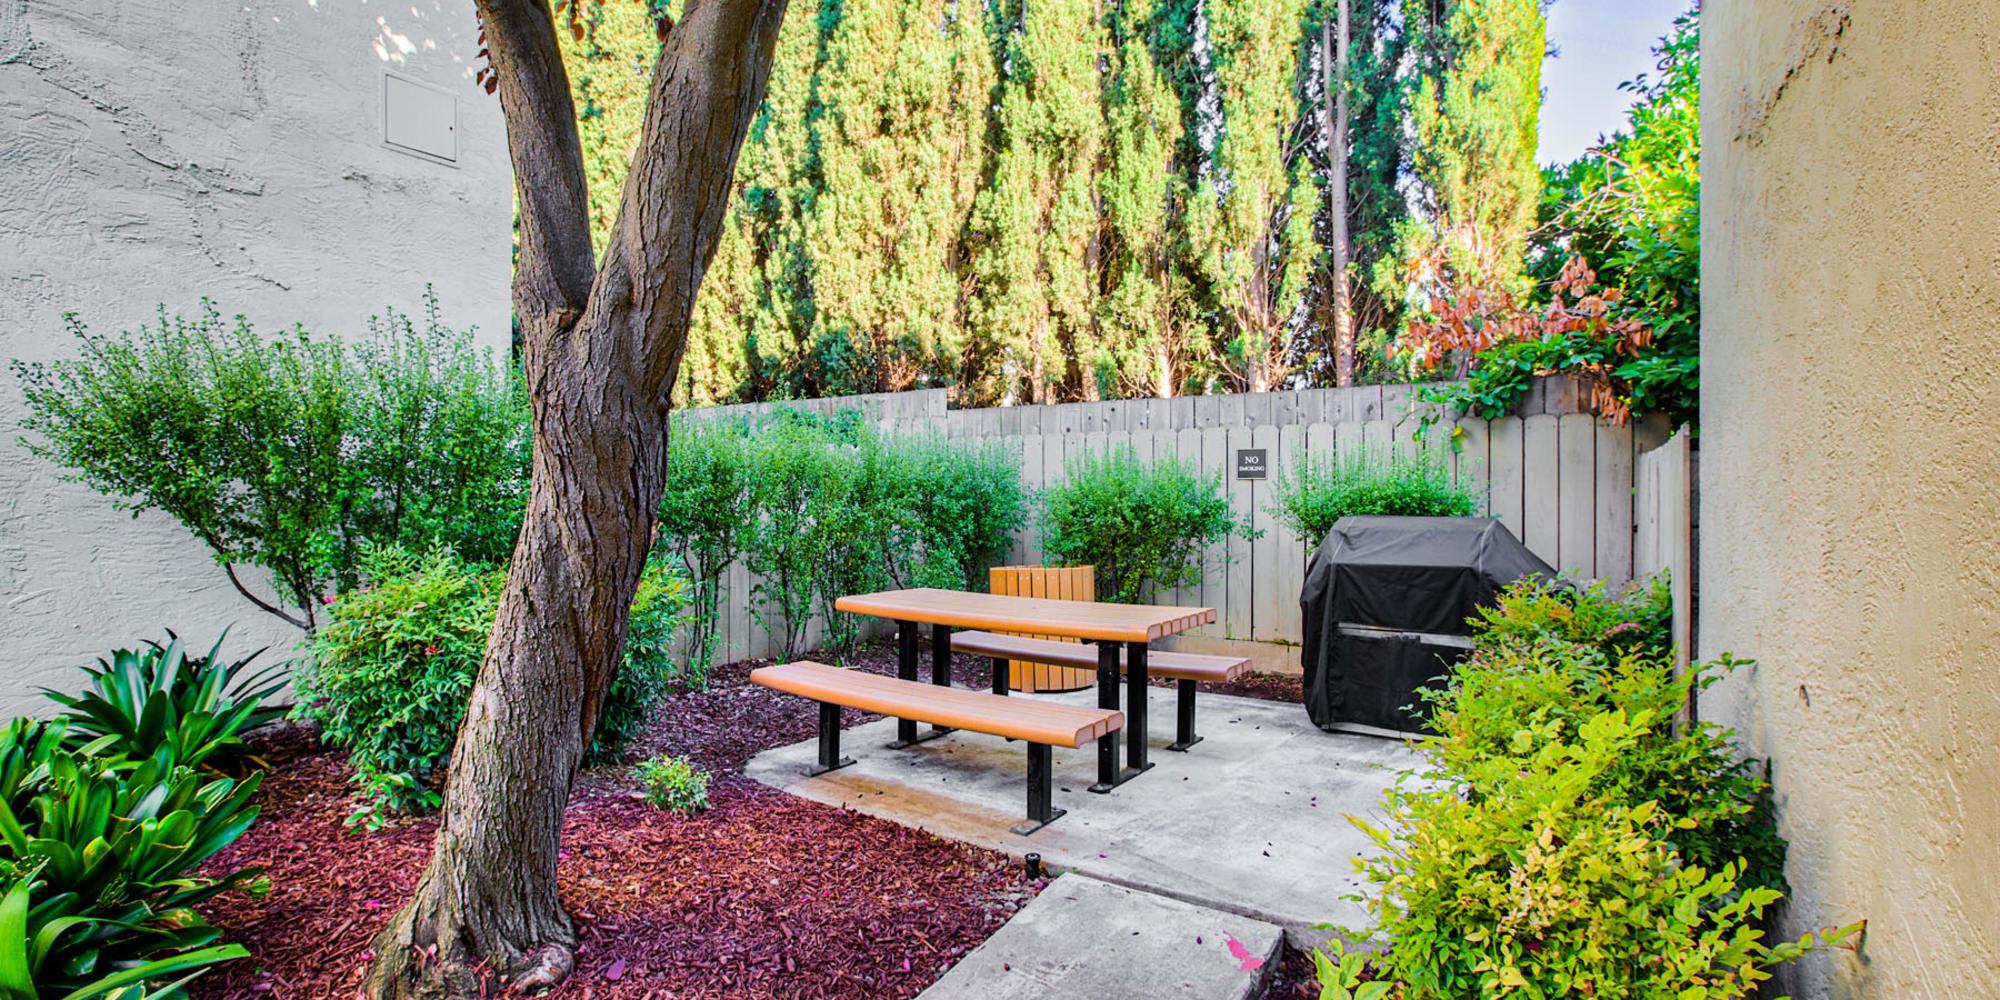 Barbecue grills at the picnic area at Pleasanton Place Apartment Homes in Pleasanton, California